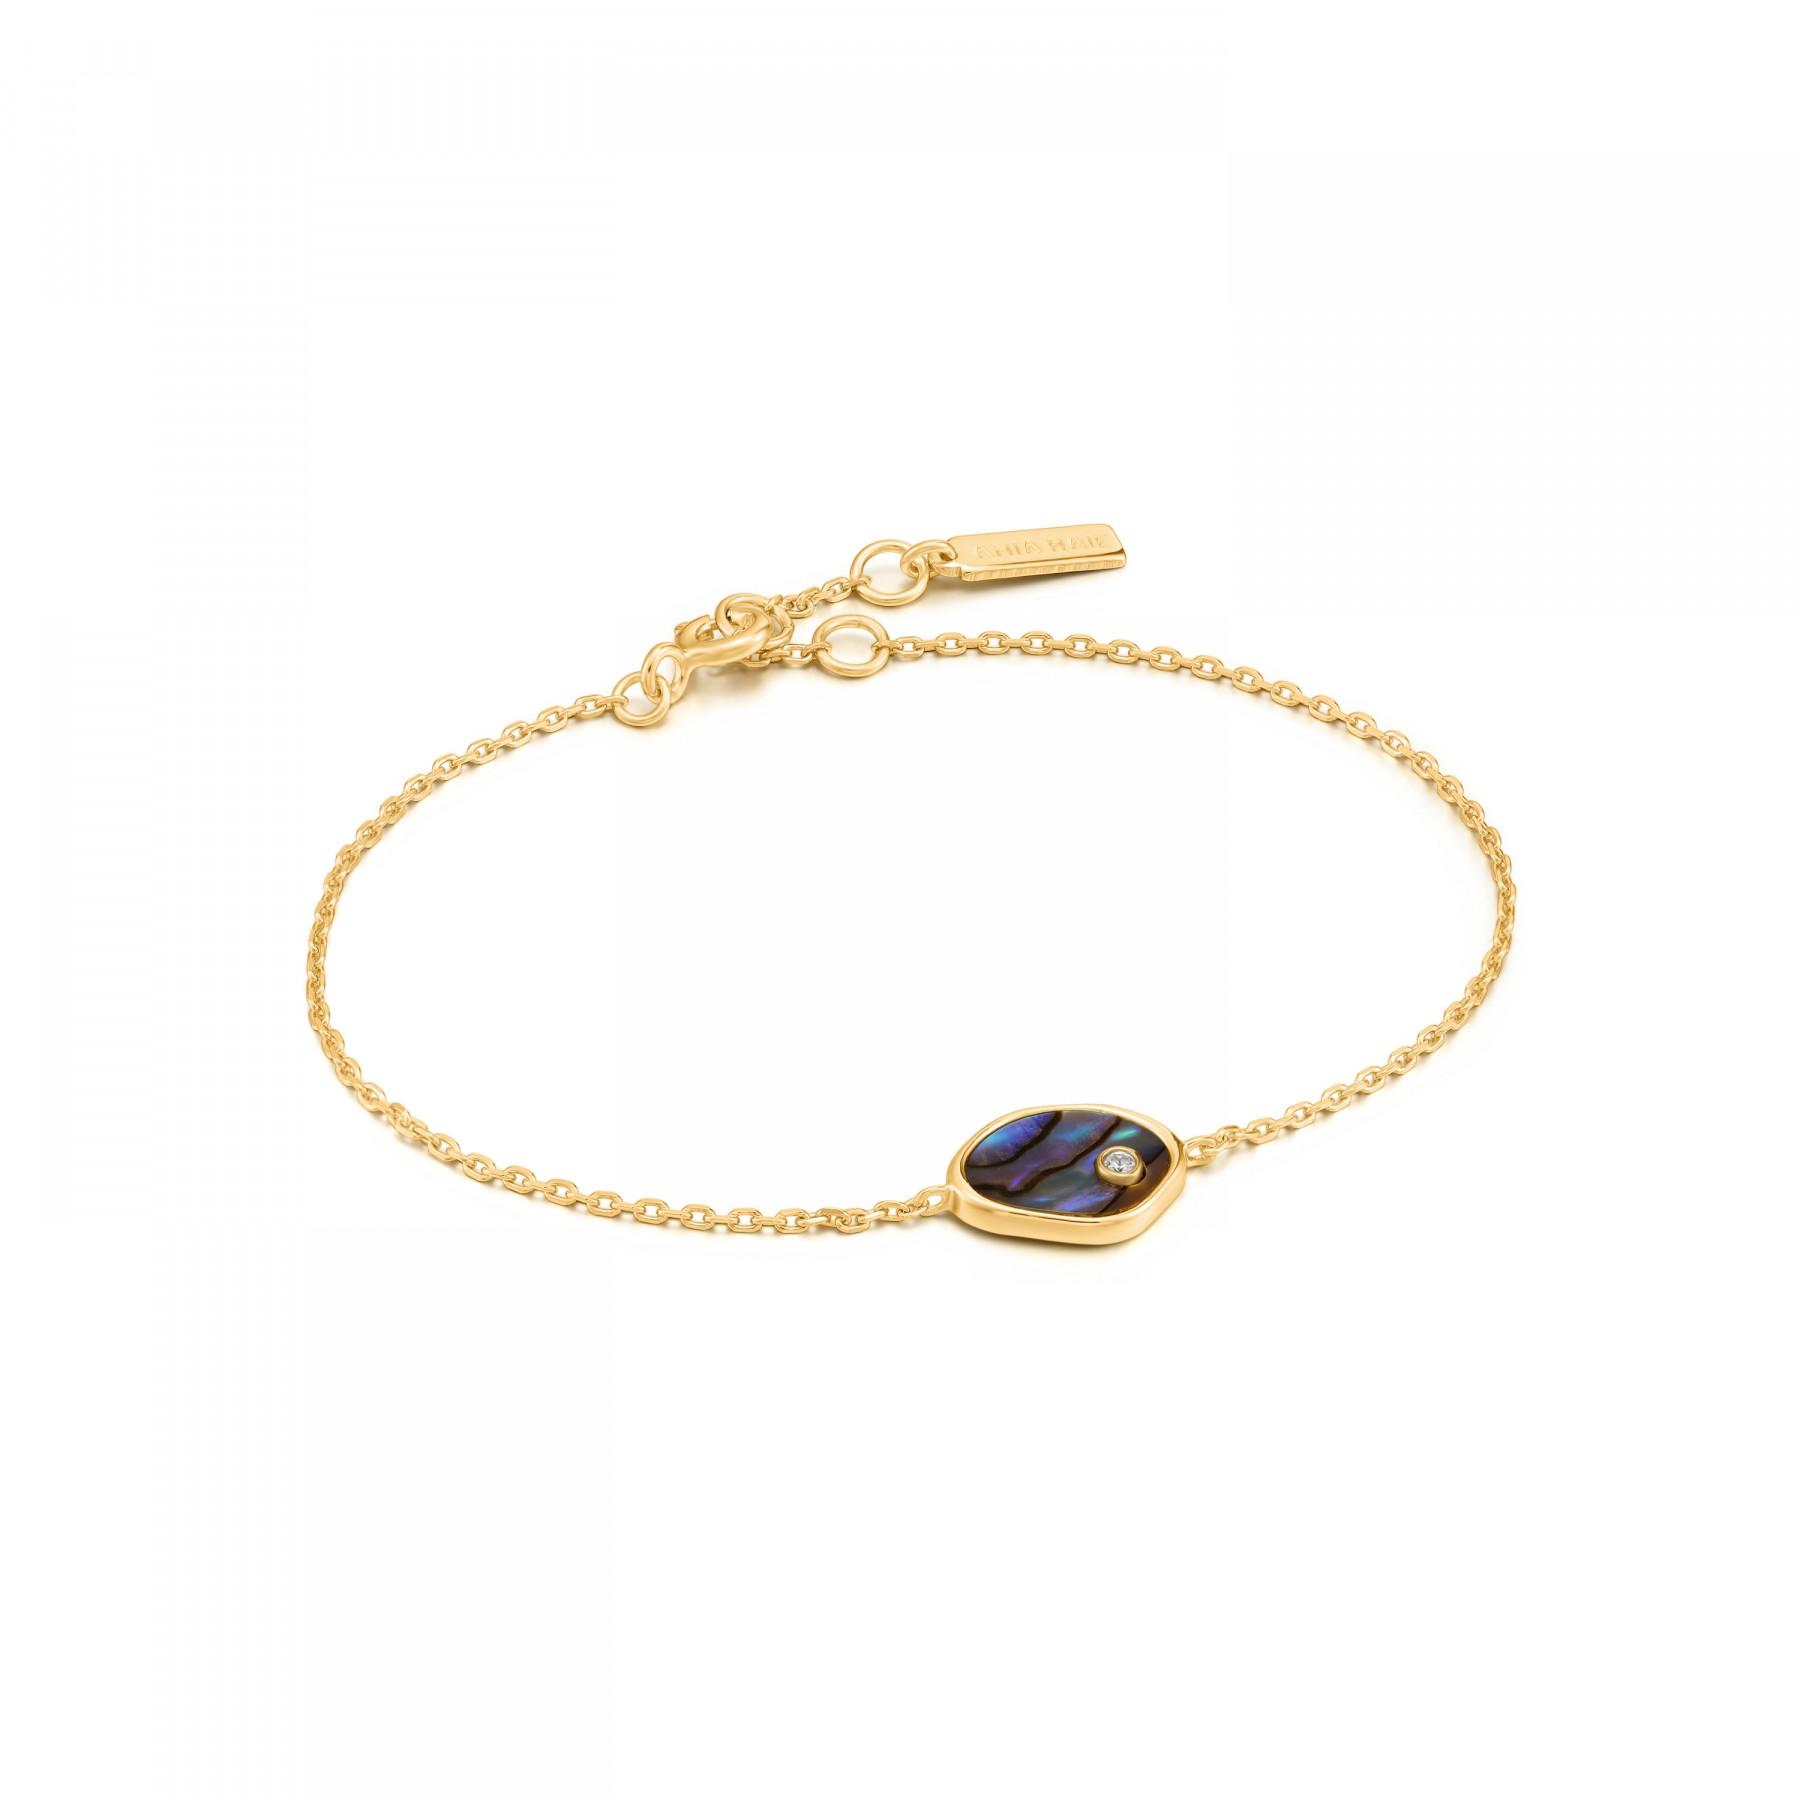 Ania Haie Turning Tides AH B027.01G Dames Armband 18,5 cm Dames 1